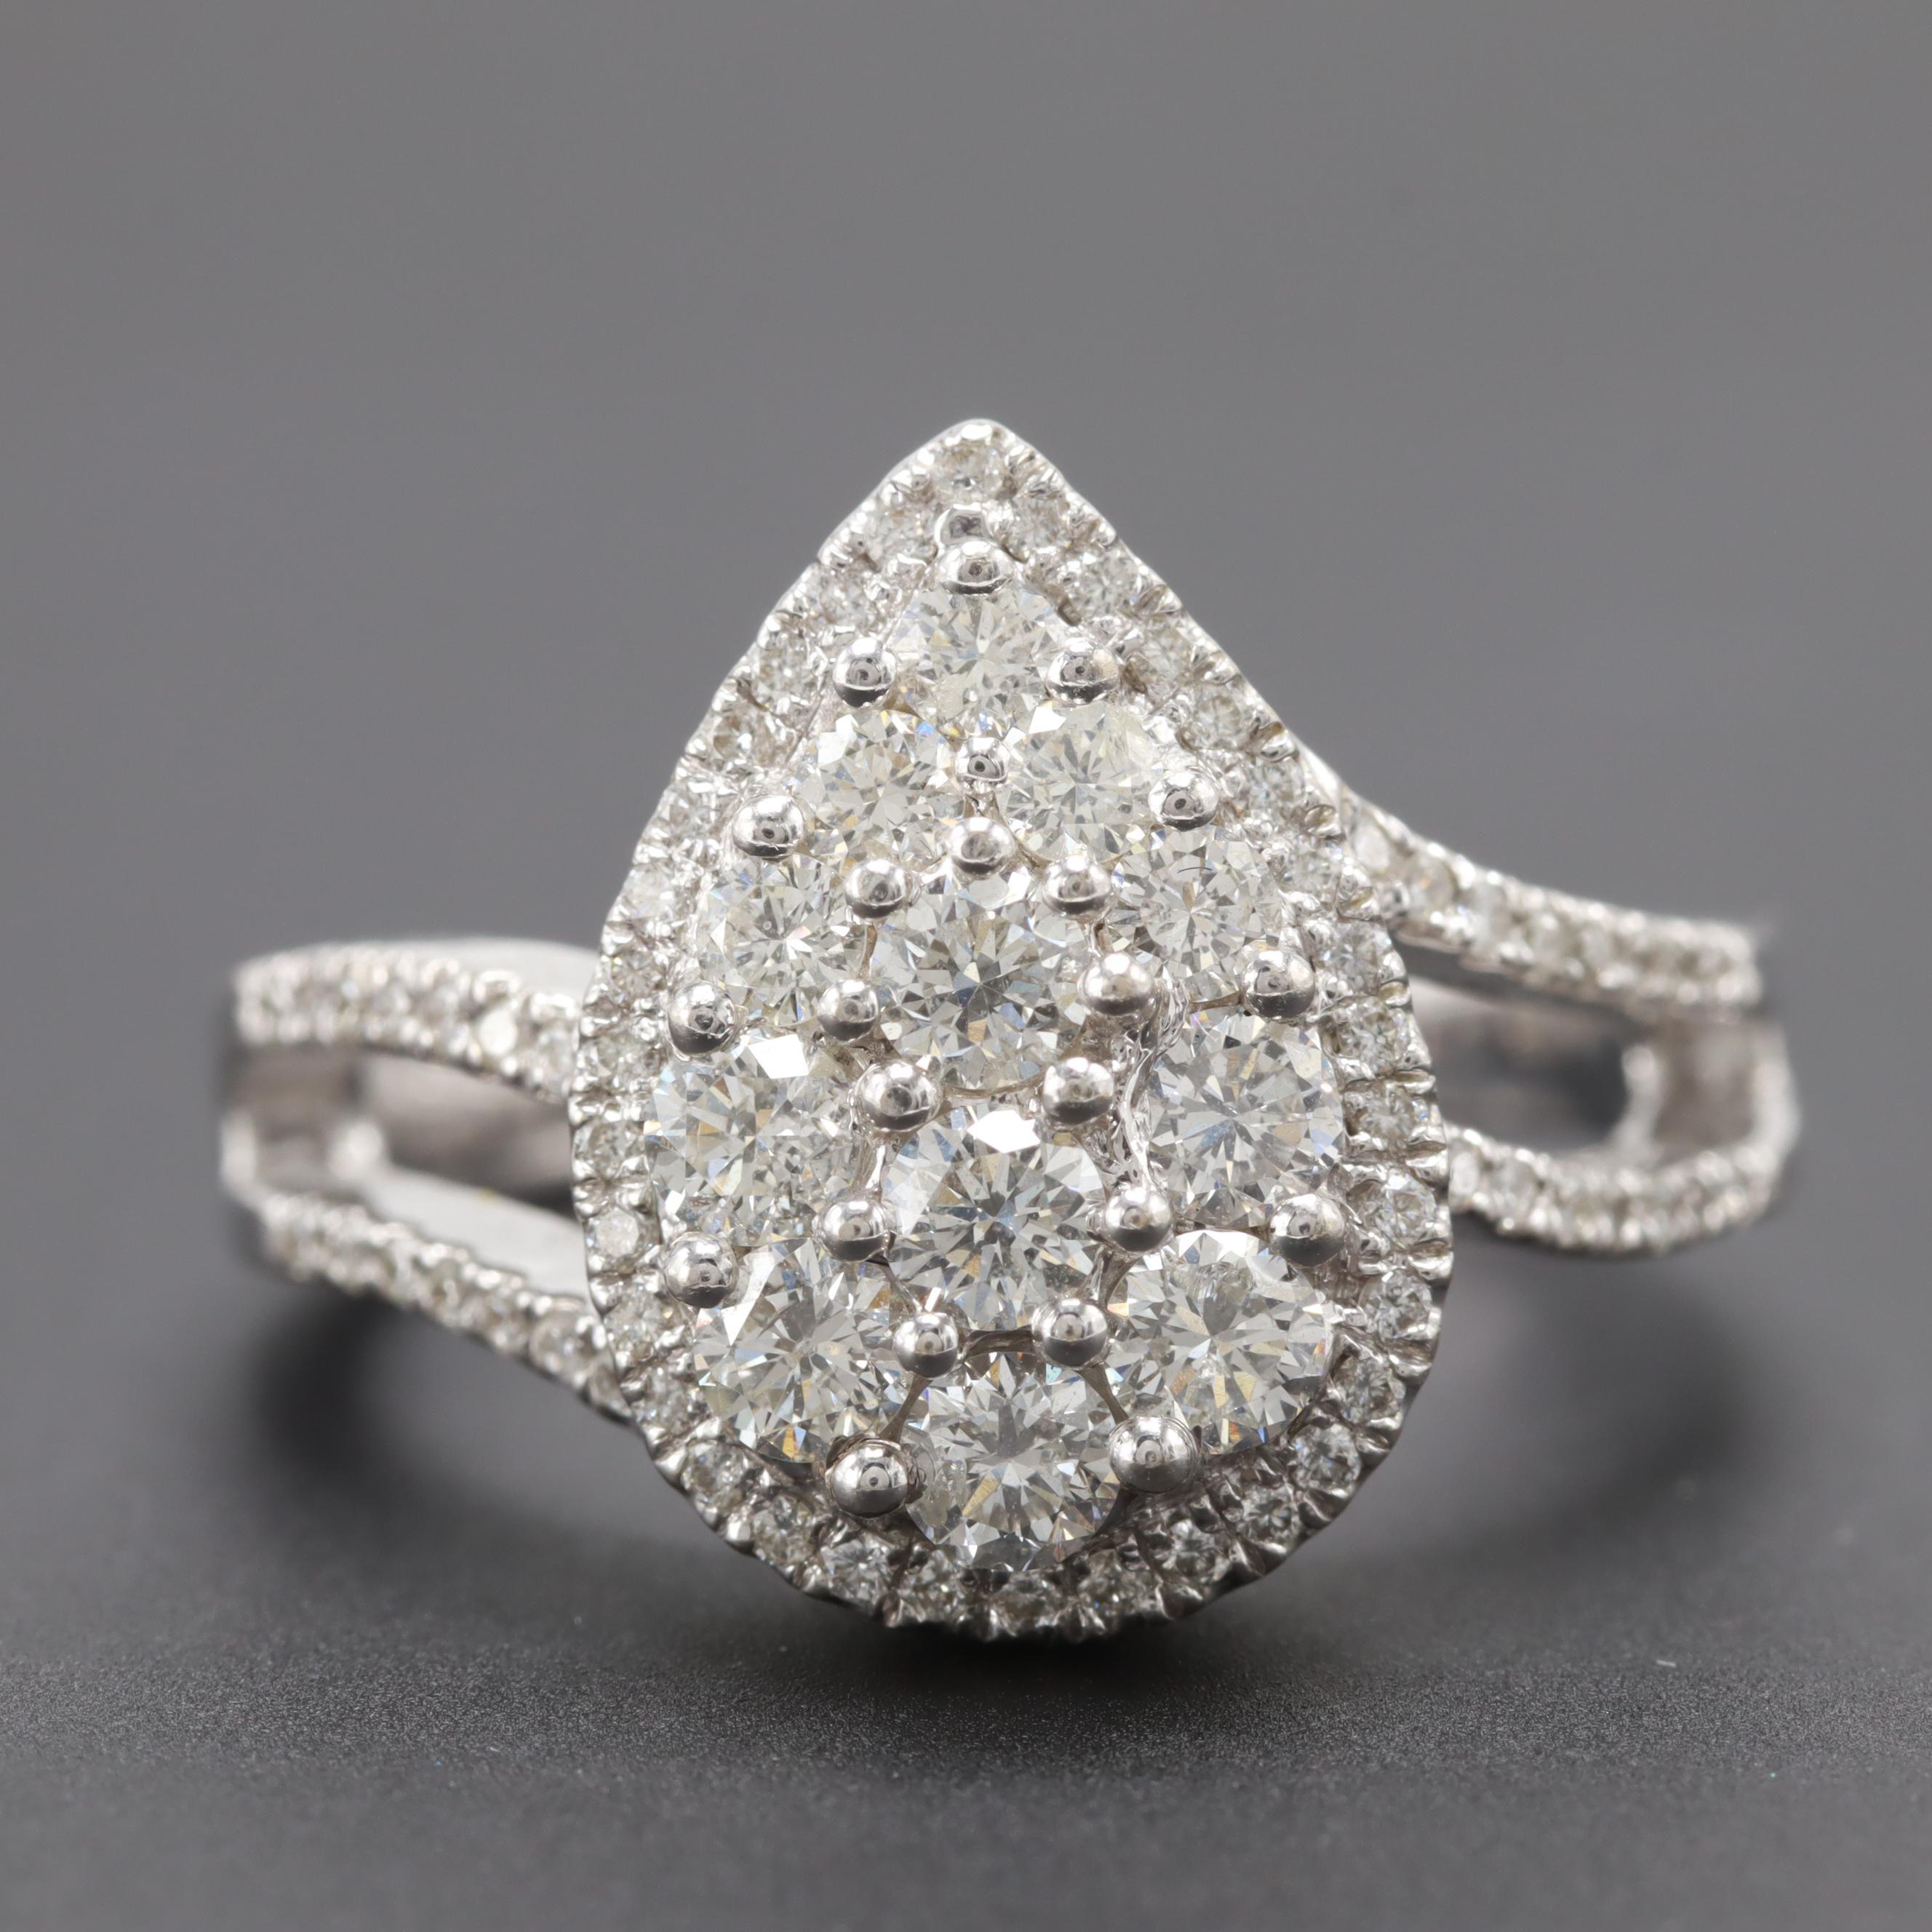 14K White Gold 1.27 CTW Diamond Ring